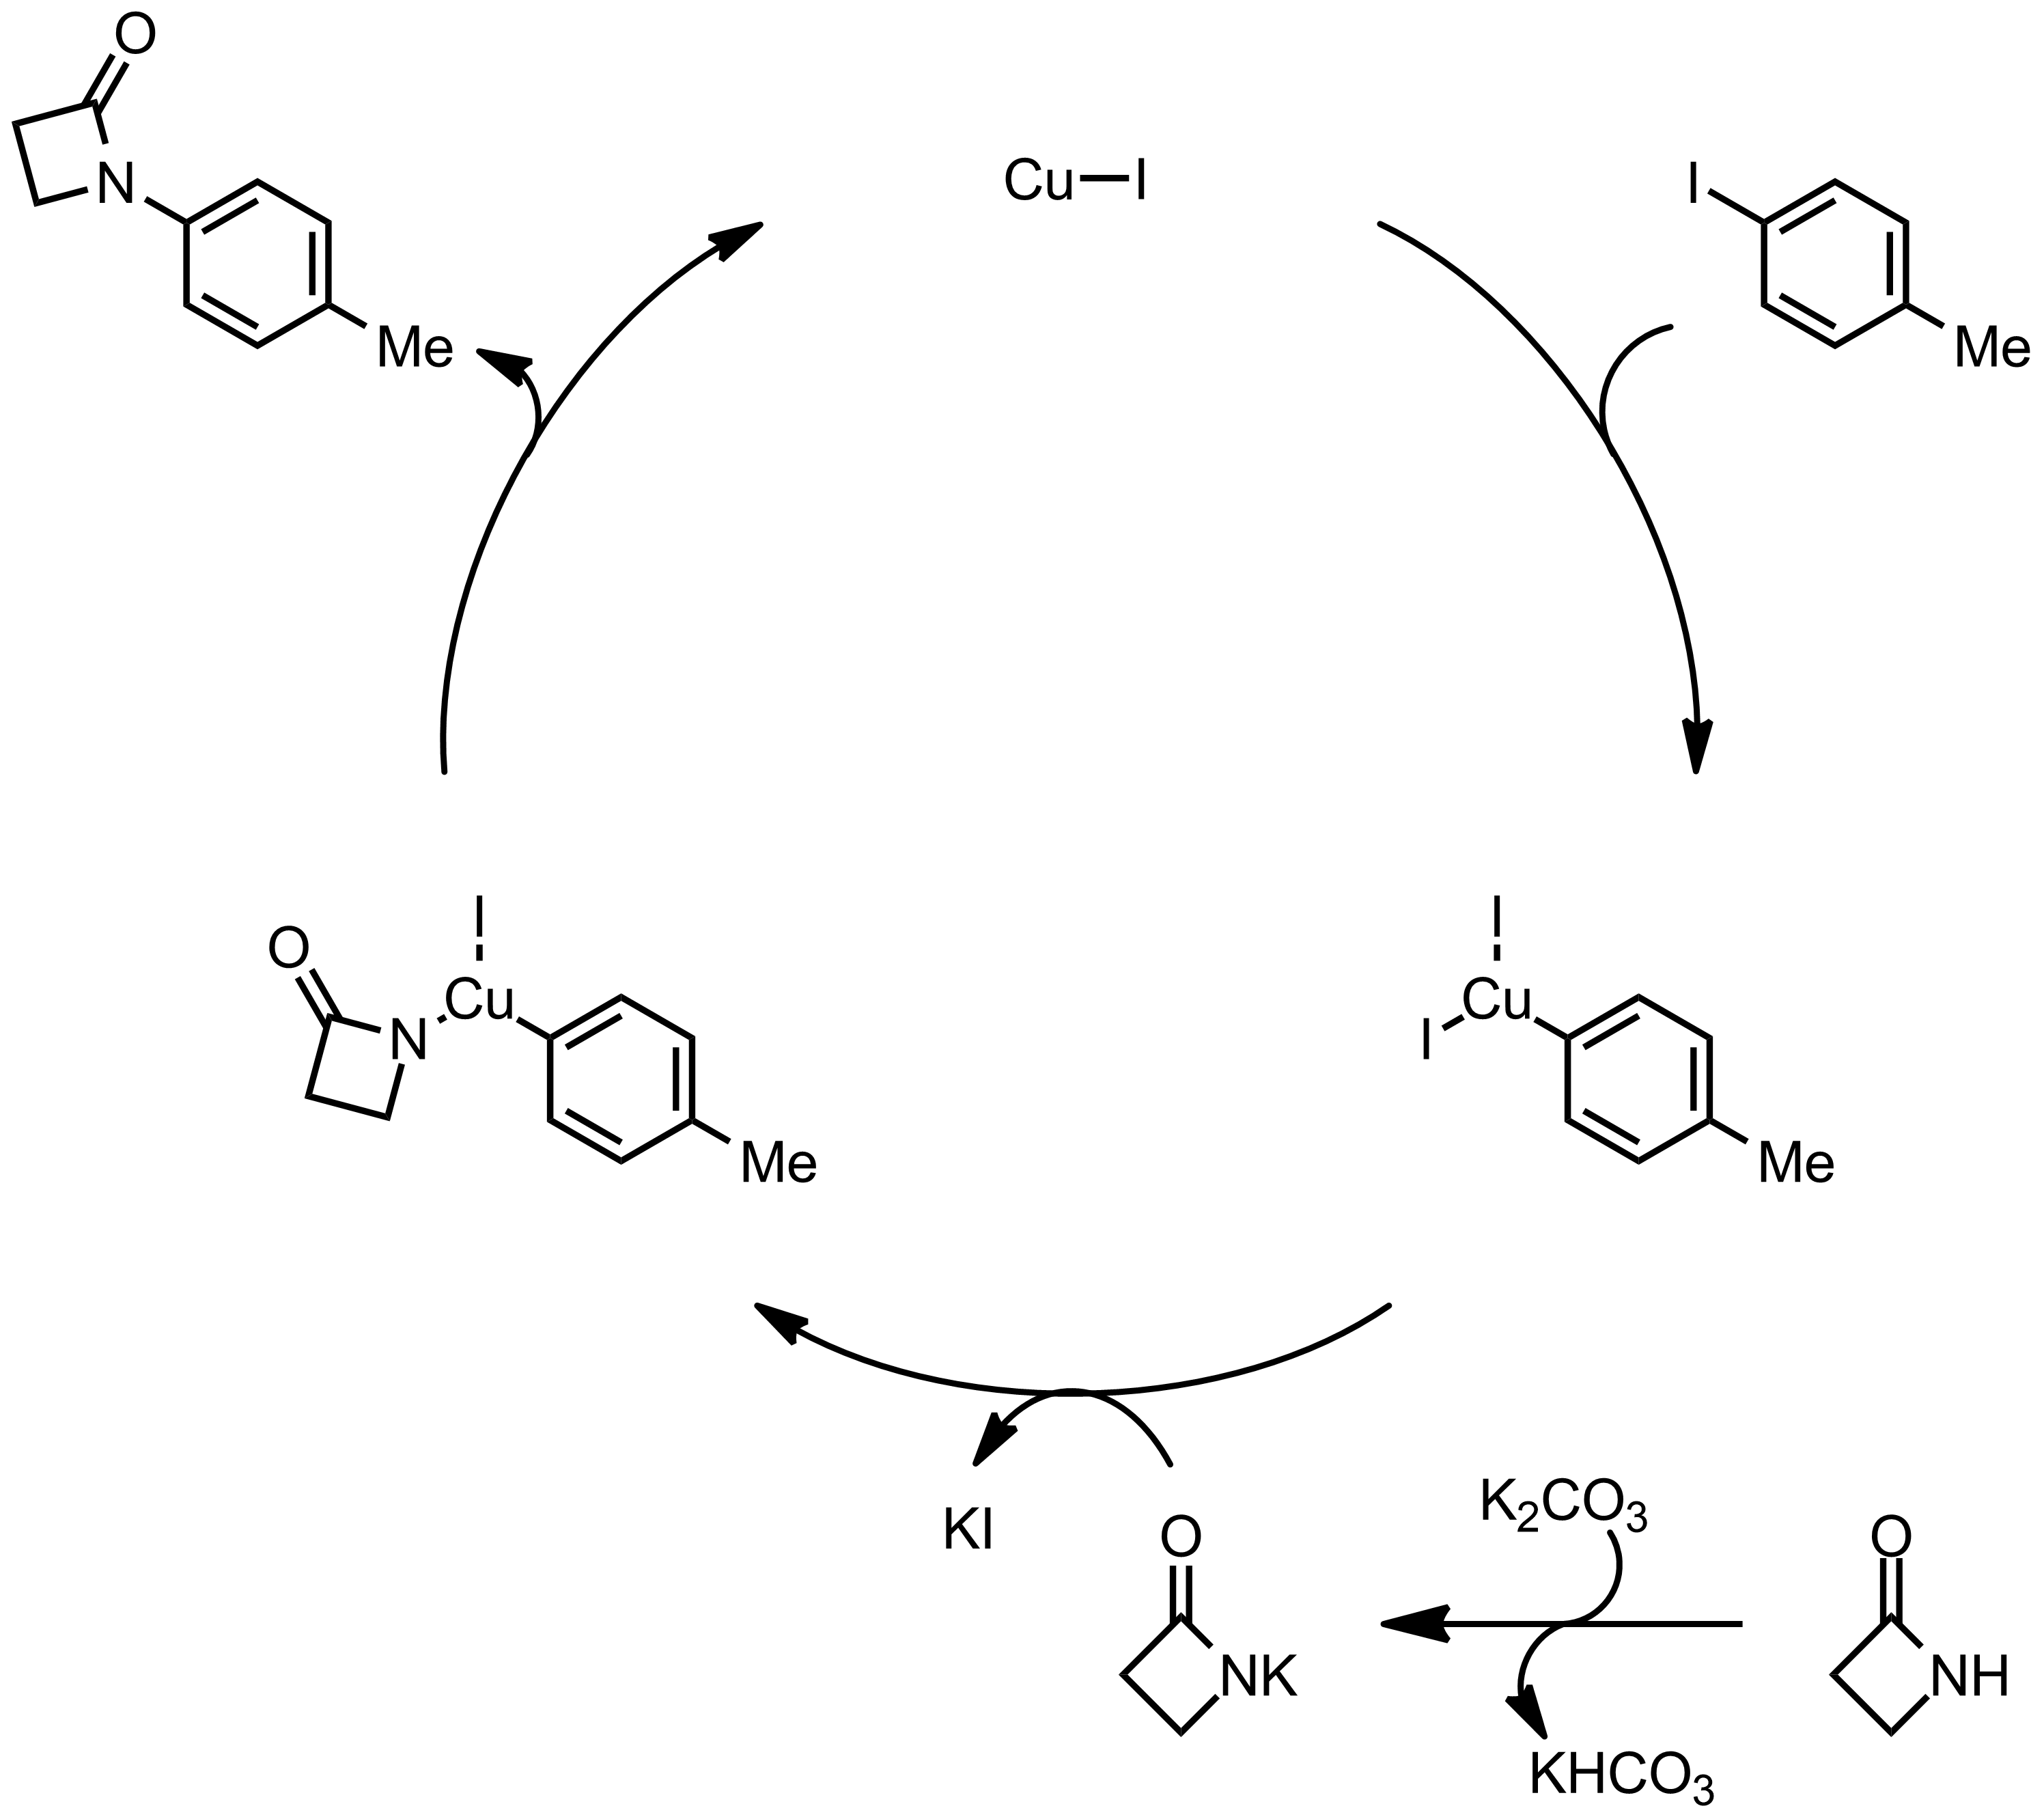 Mechanism of the Goldberg Reaction